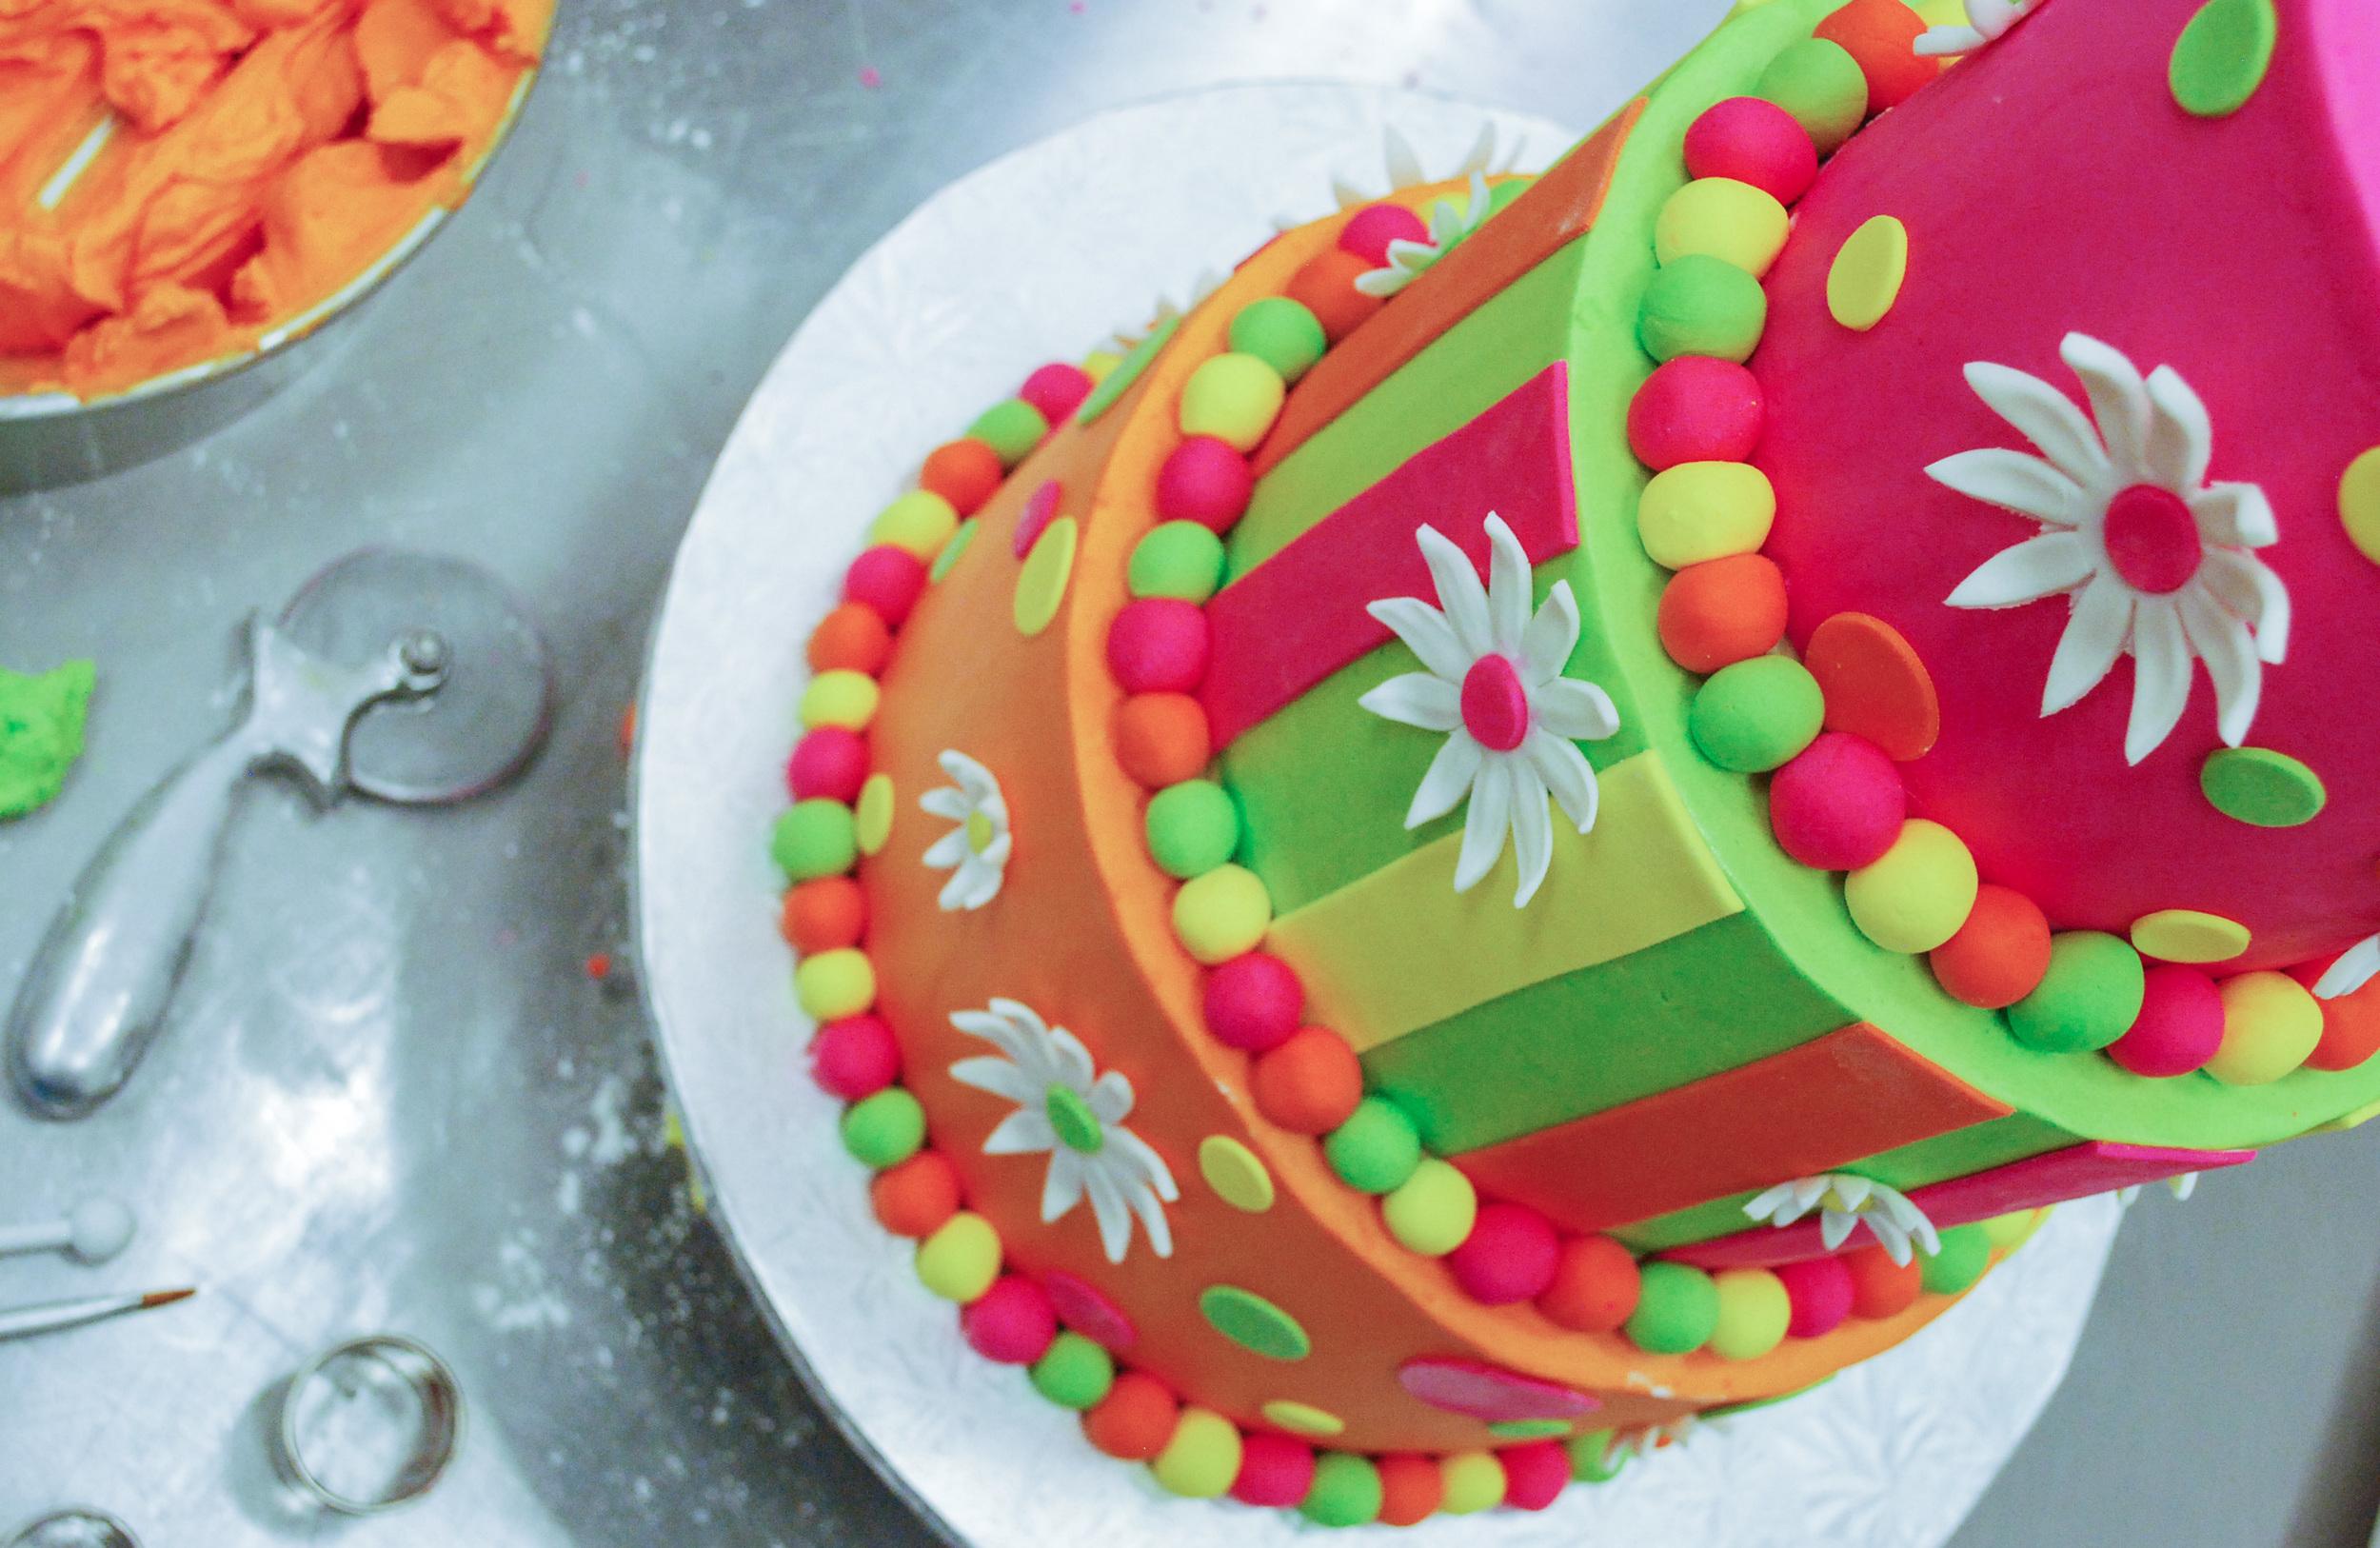 Decorated Cakes_1.jpg